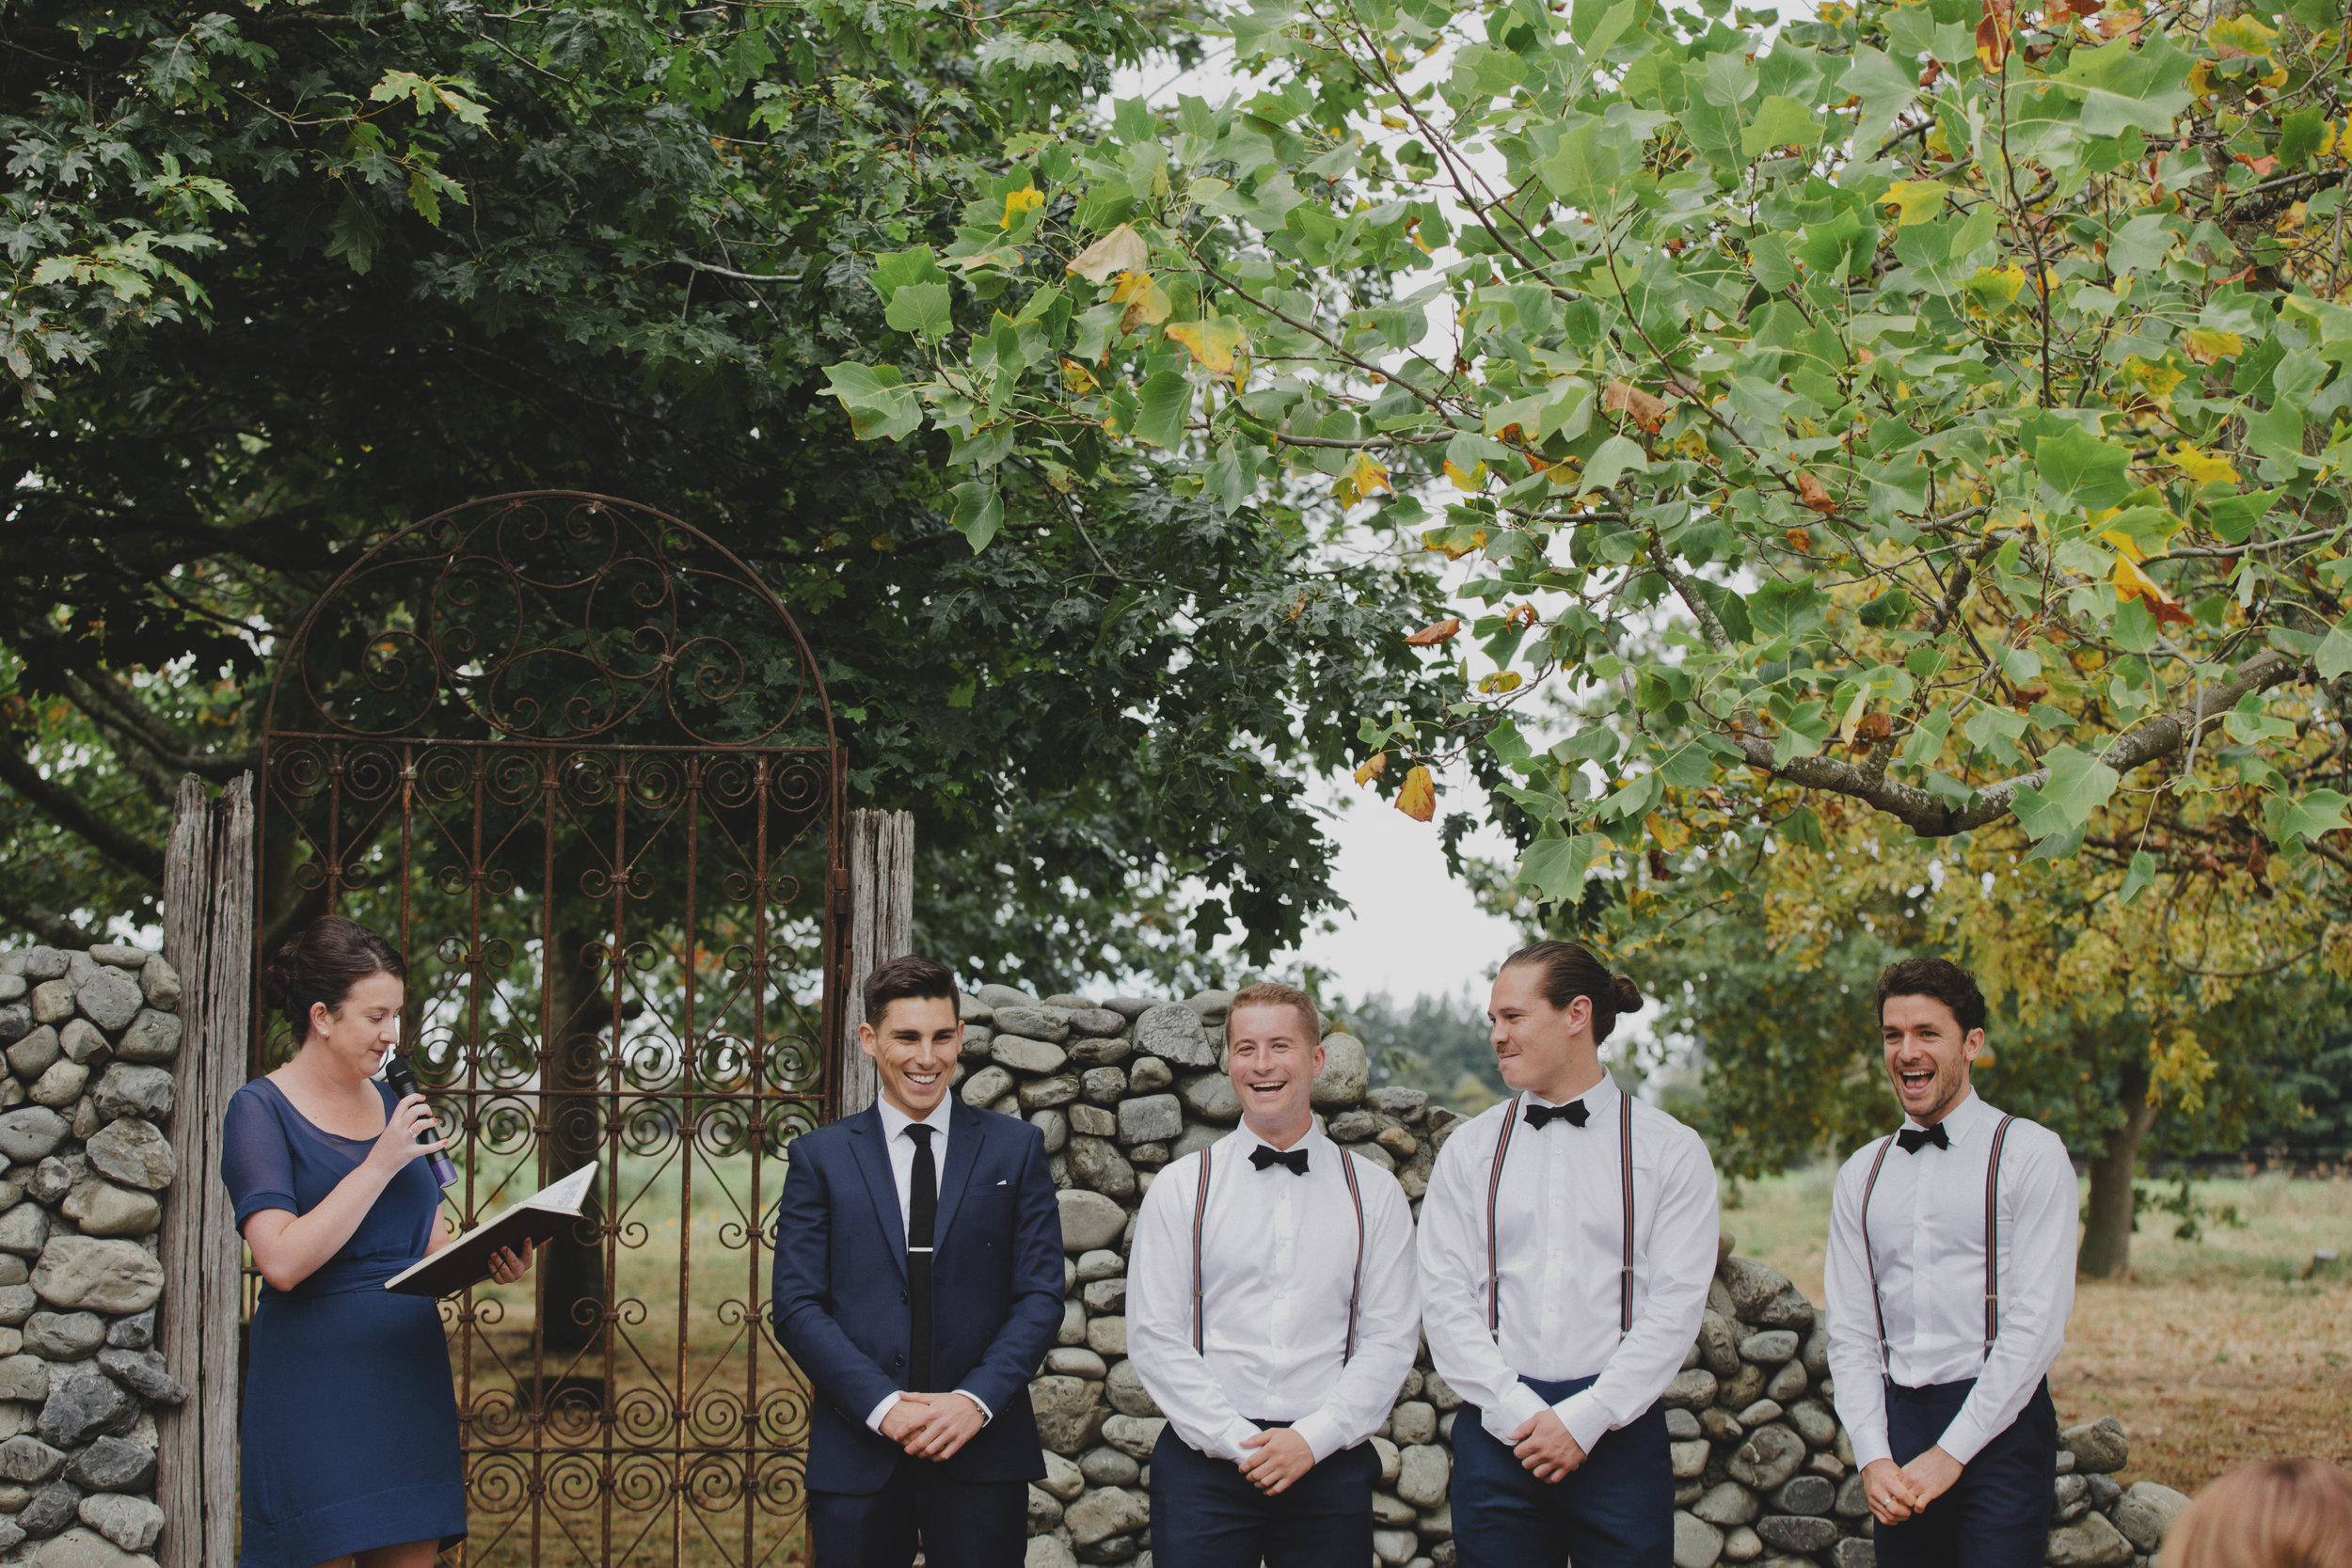 wellington wedding photography NZ - 1027.JPG